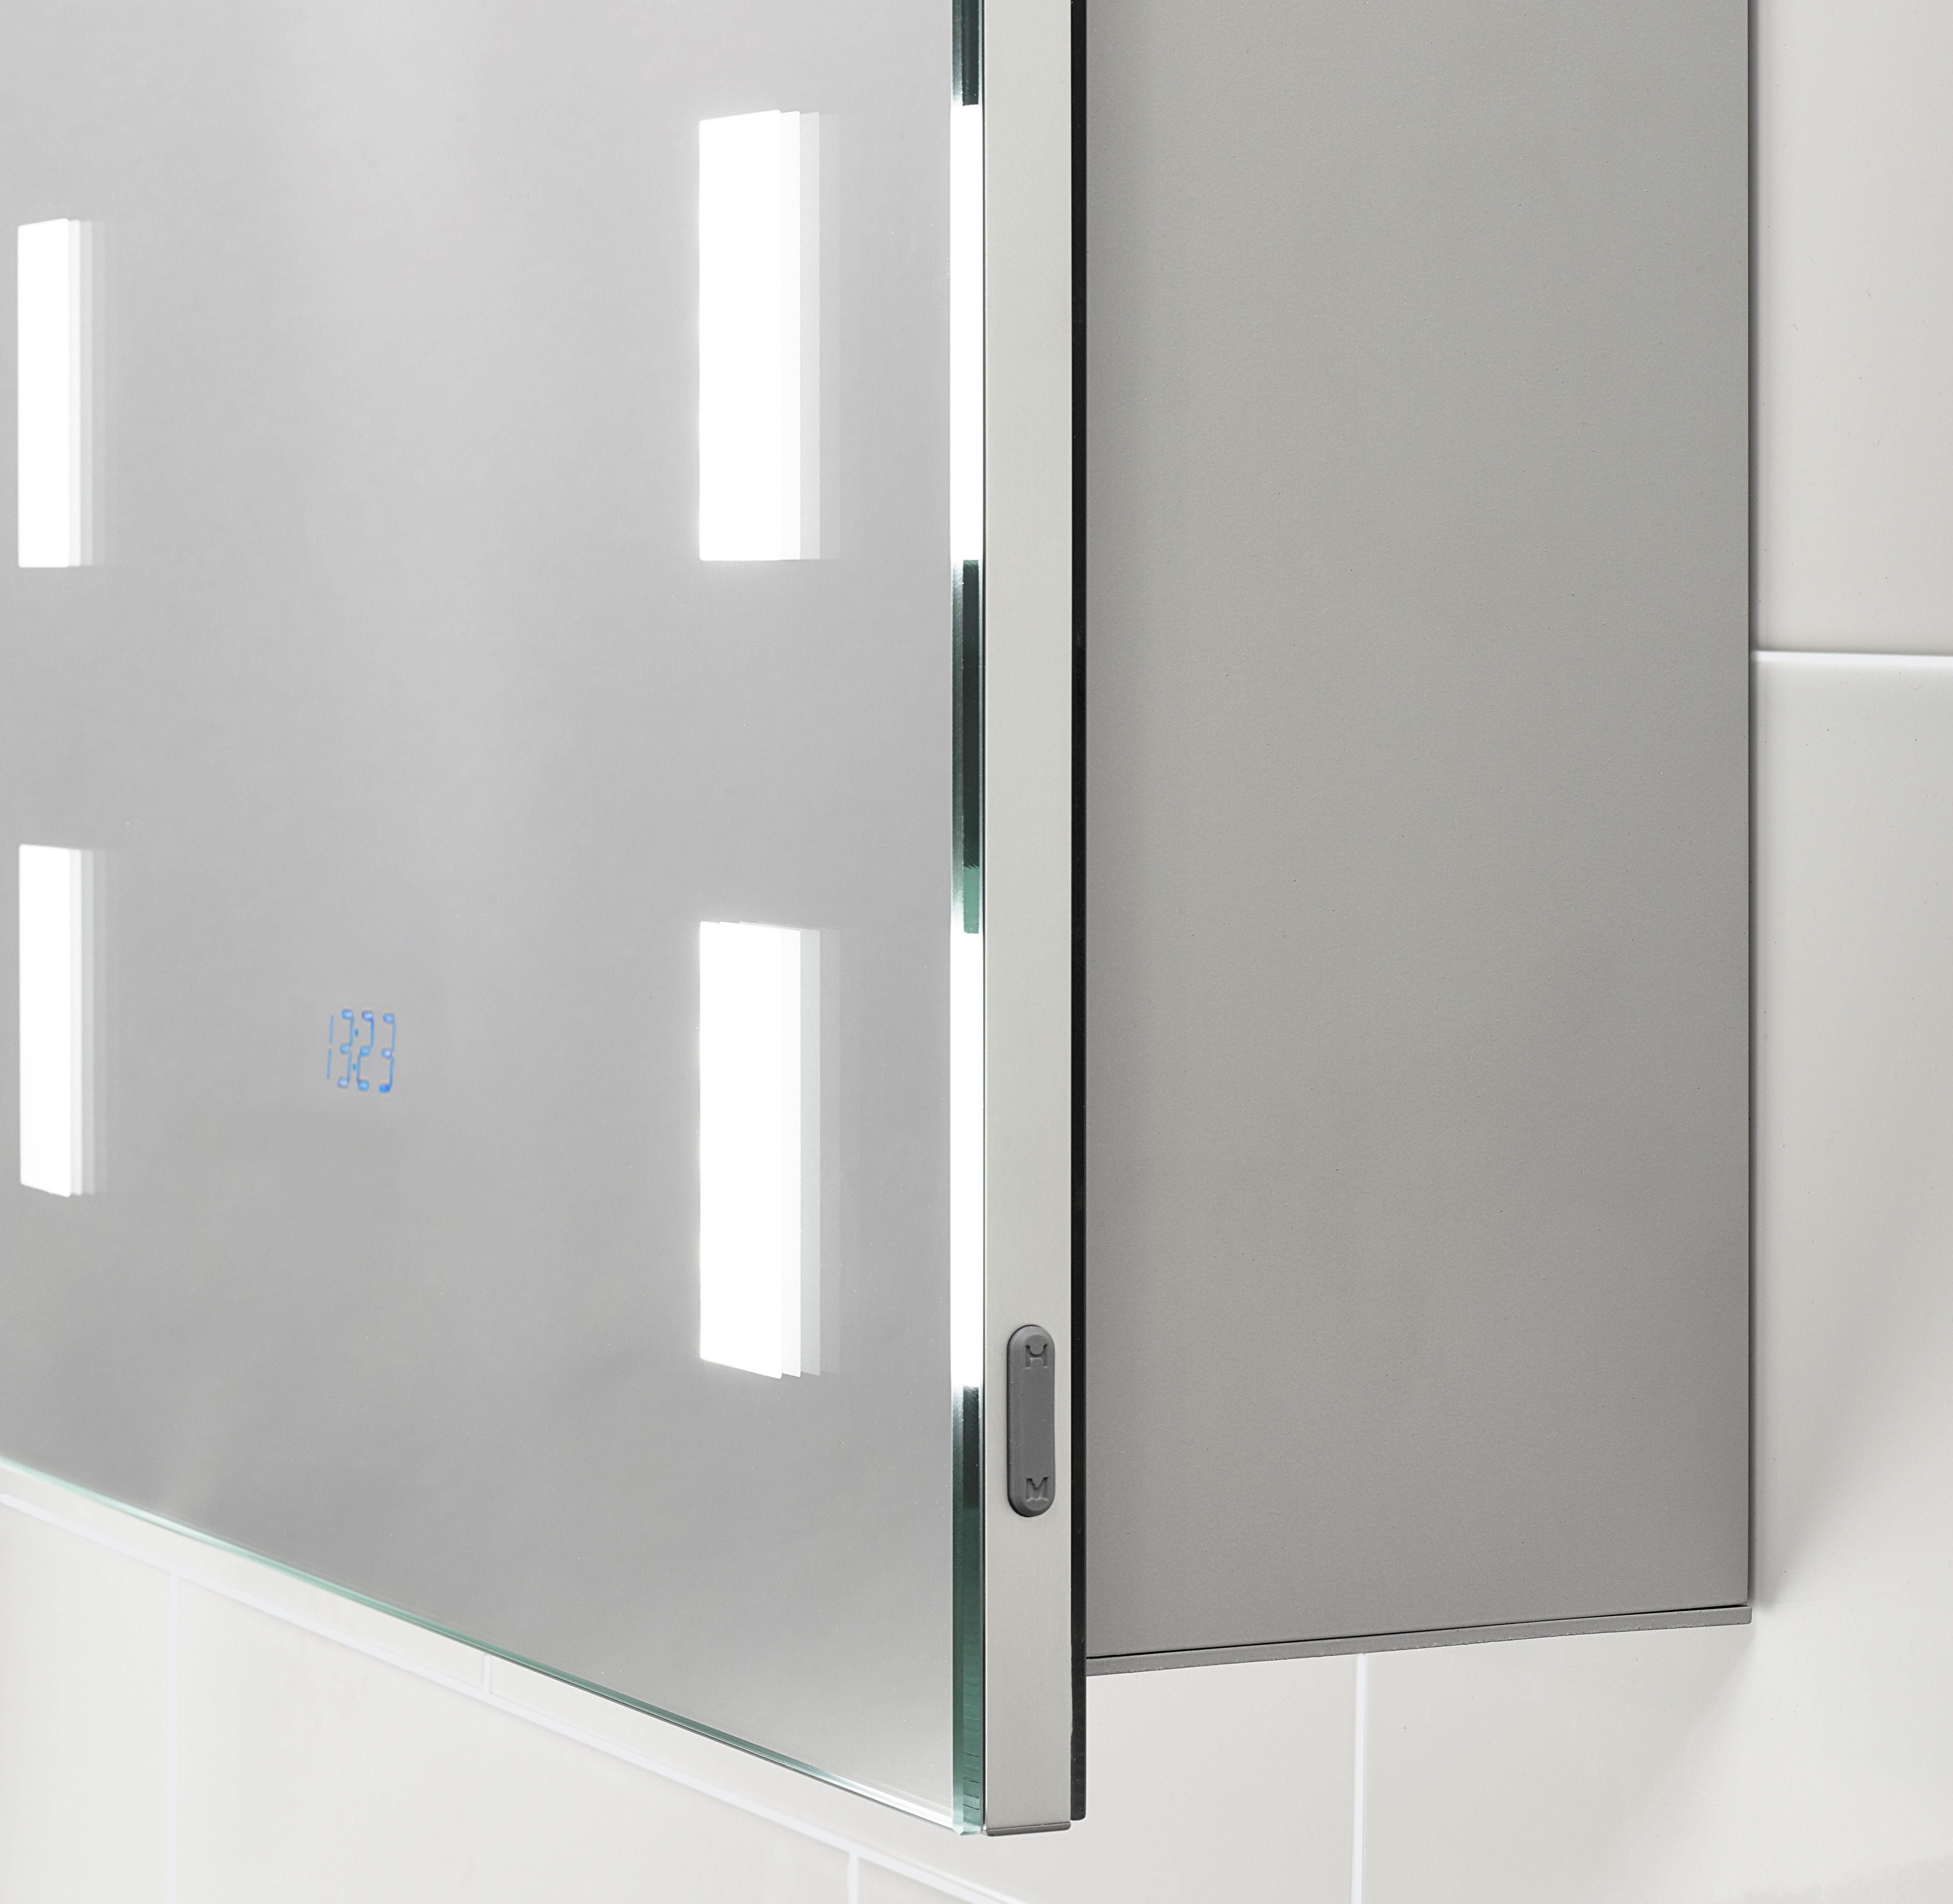 Renee Illuminated Cabinet With Built In Digital Clock 500 X 700 Mm Cabinet Bathroom Cabinets Locker Storage